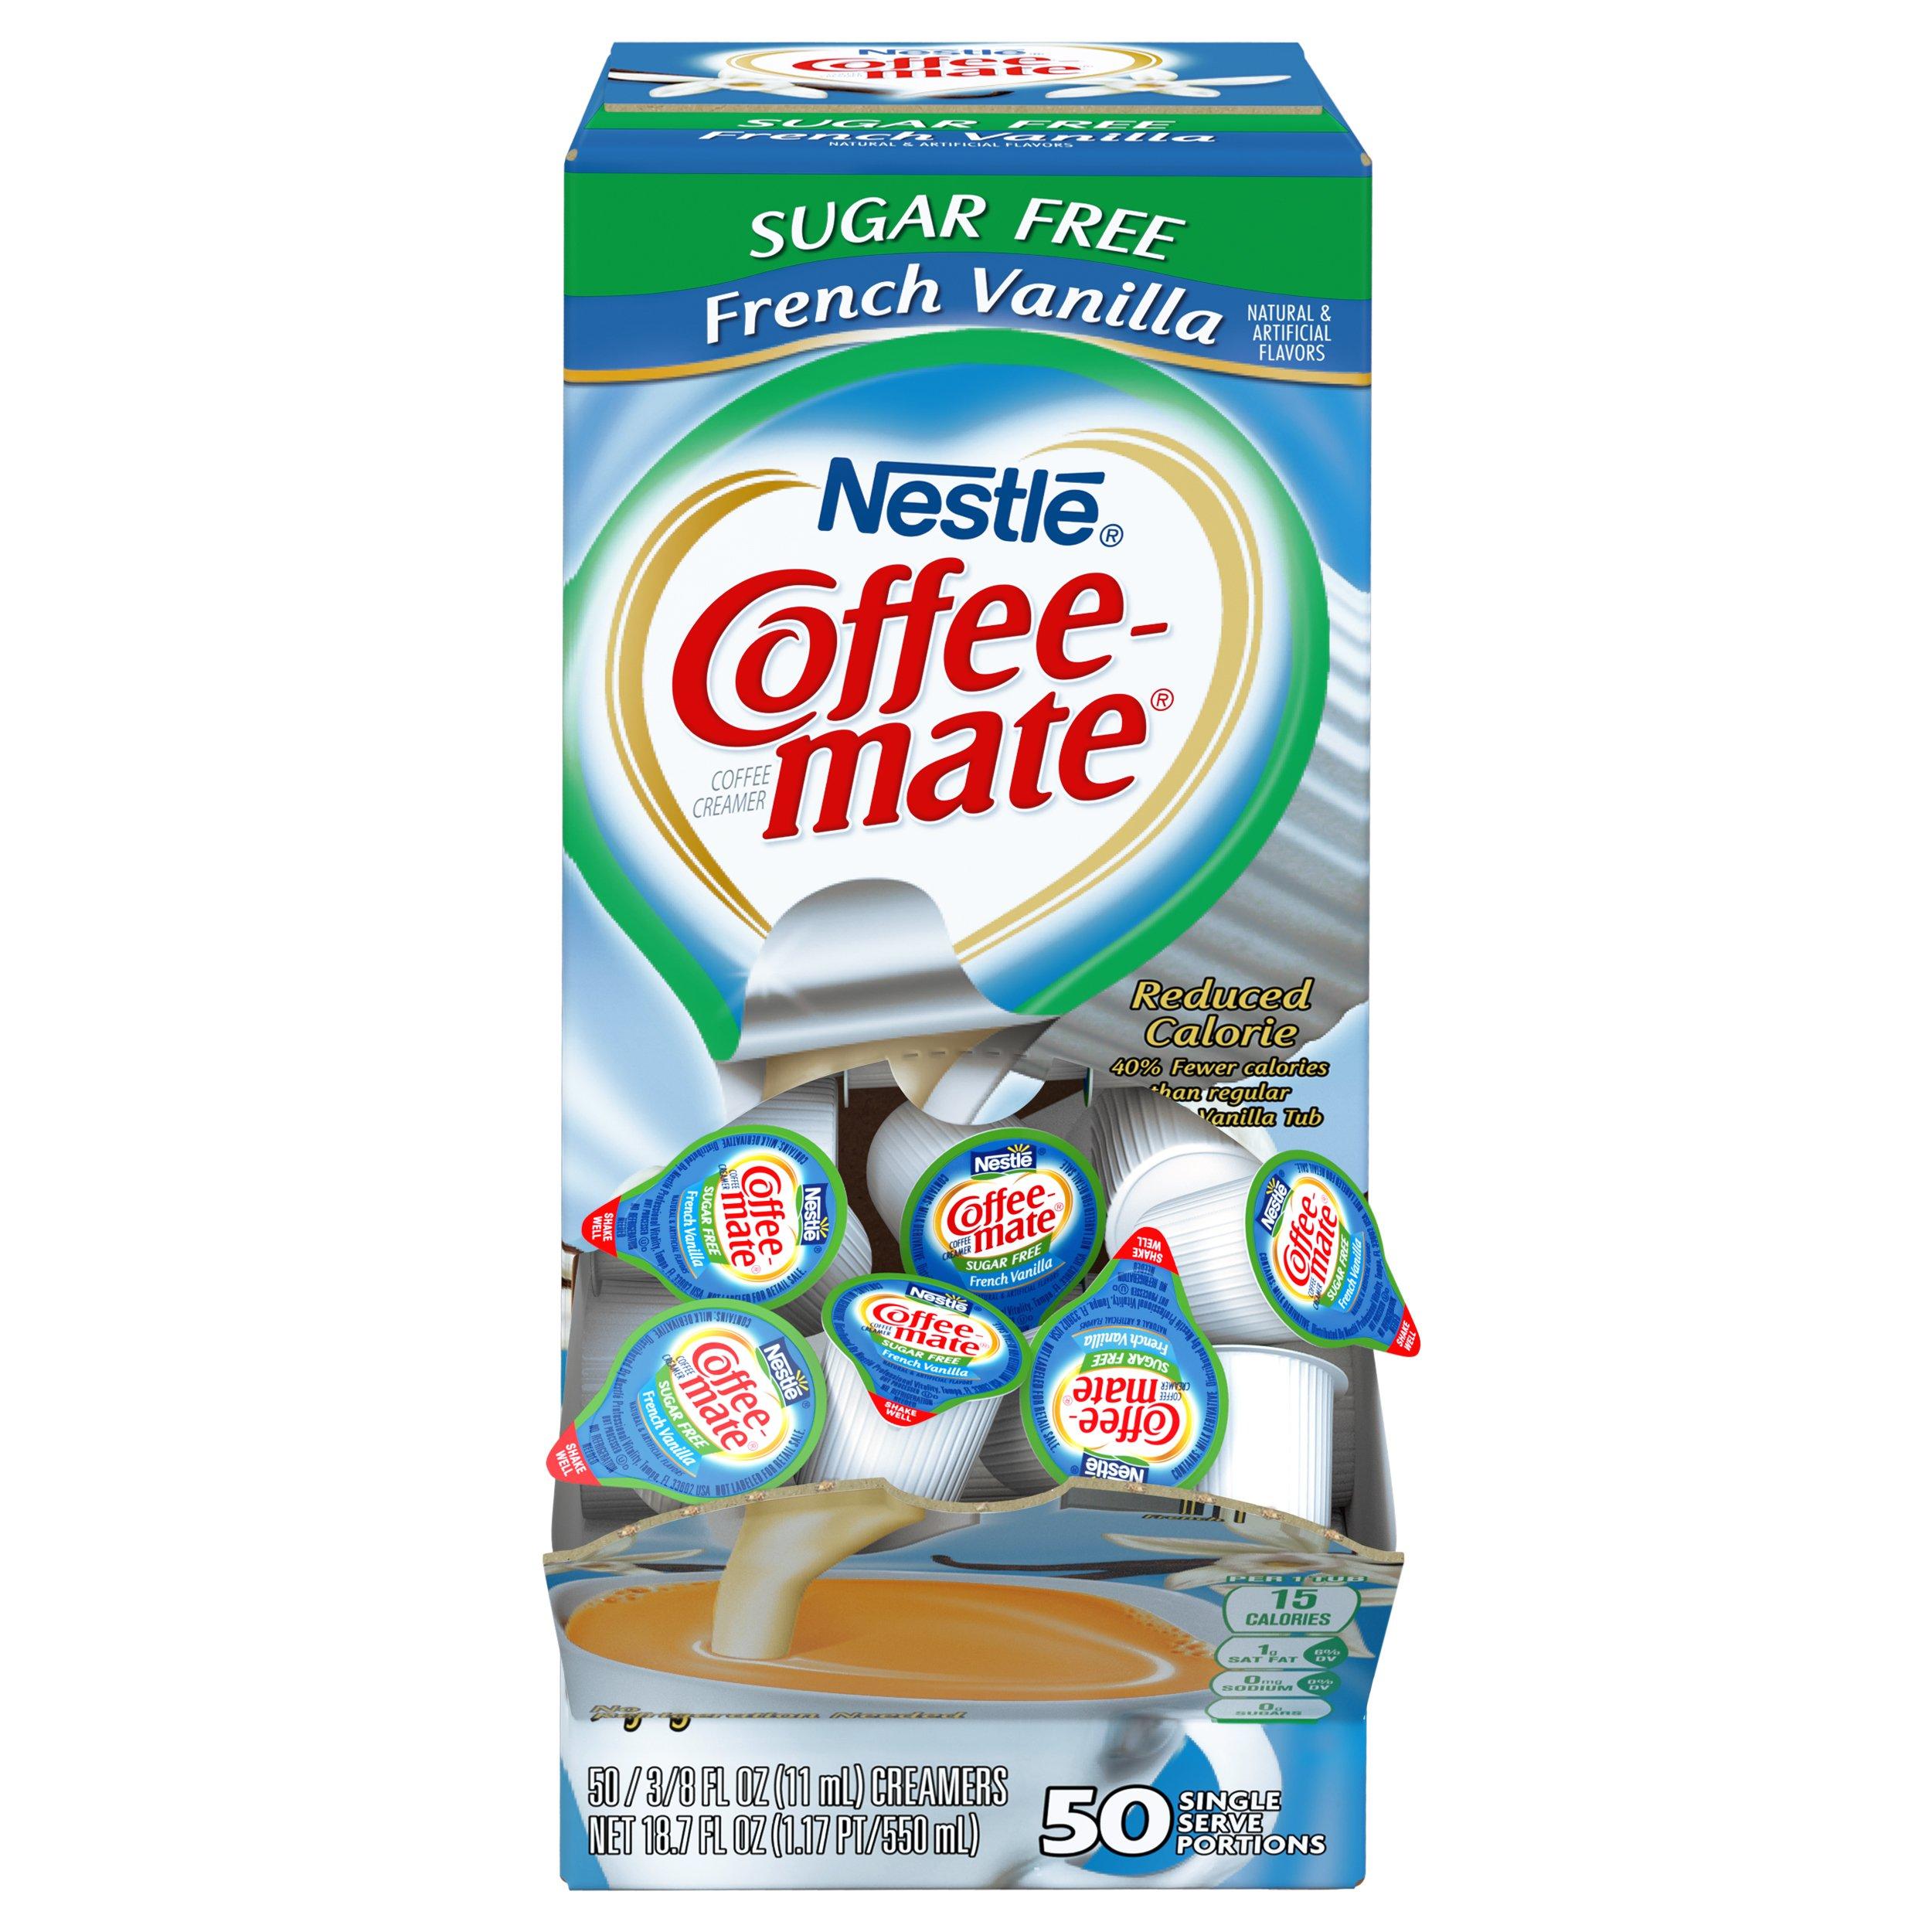 NESTLE COFFEE-MATE Coffee Creamer, Sugar Free French Vanilla, liquid creamer singles, Pack of 50 by Nestle Coffee Mate (Image #1)